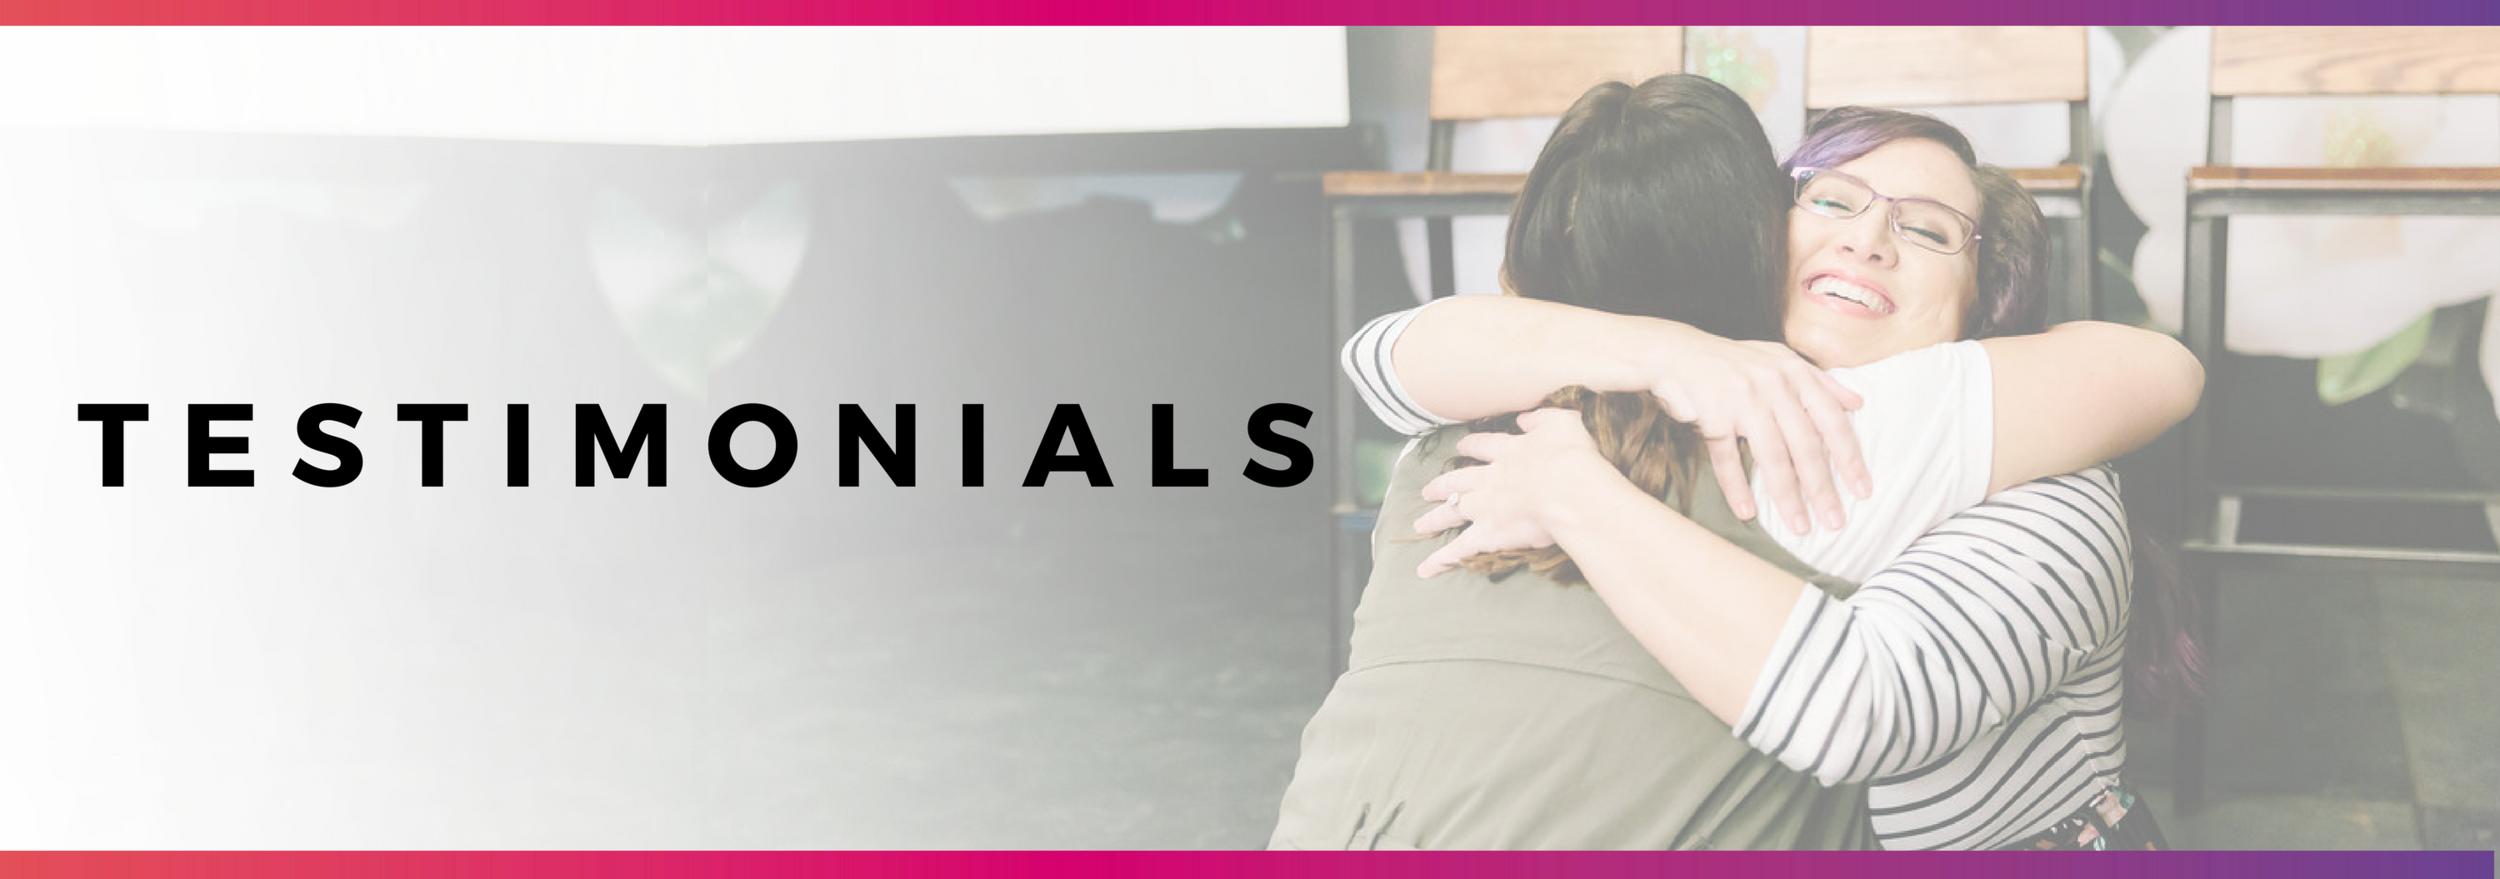 Speaking Testimonials and Client Feedback   Jessica Rasdall